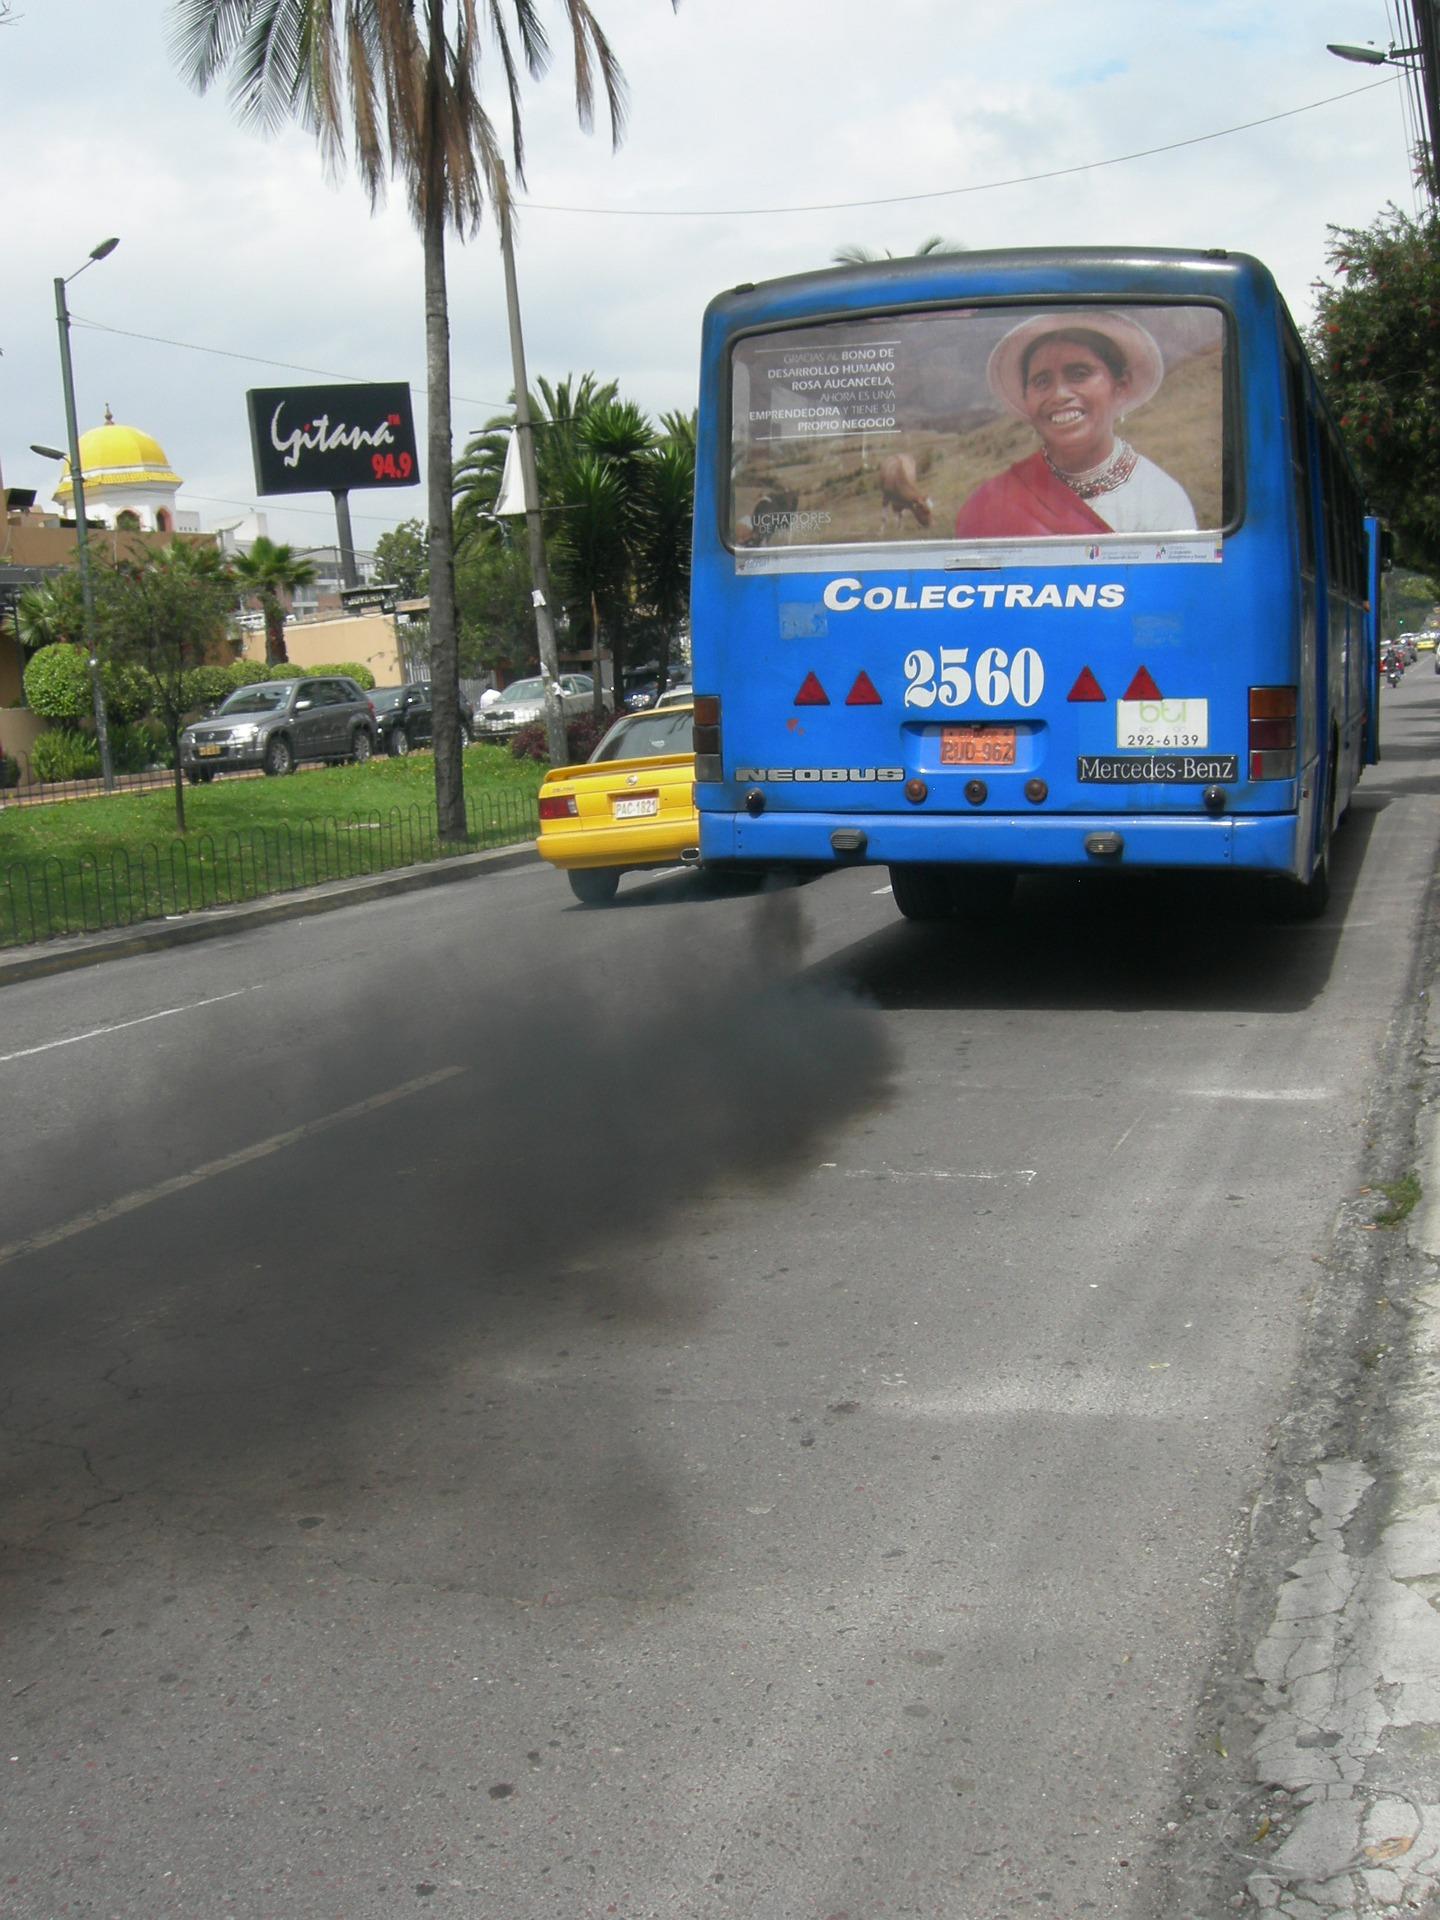 exhaust-fumes-372691_1920